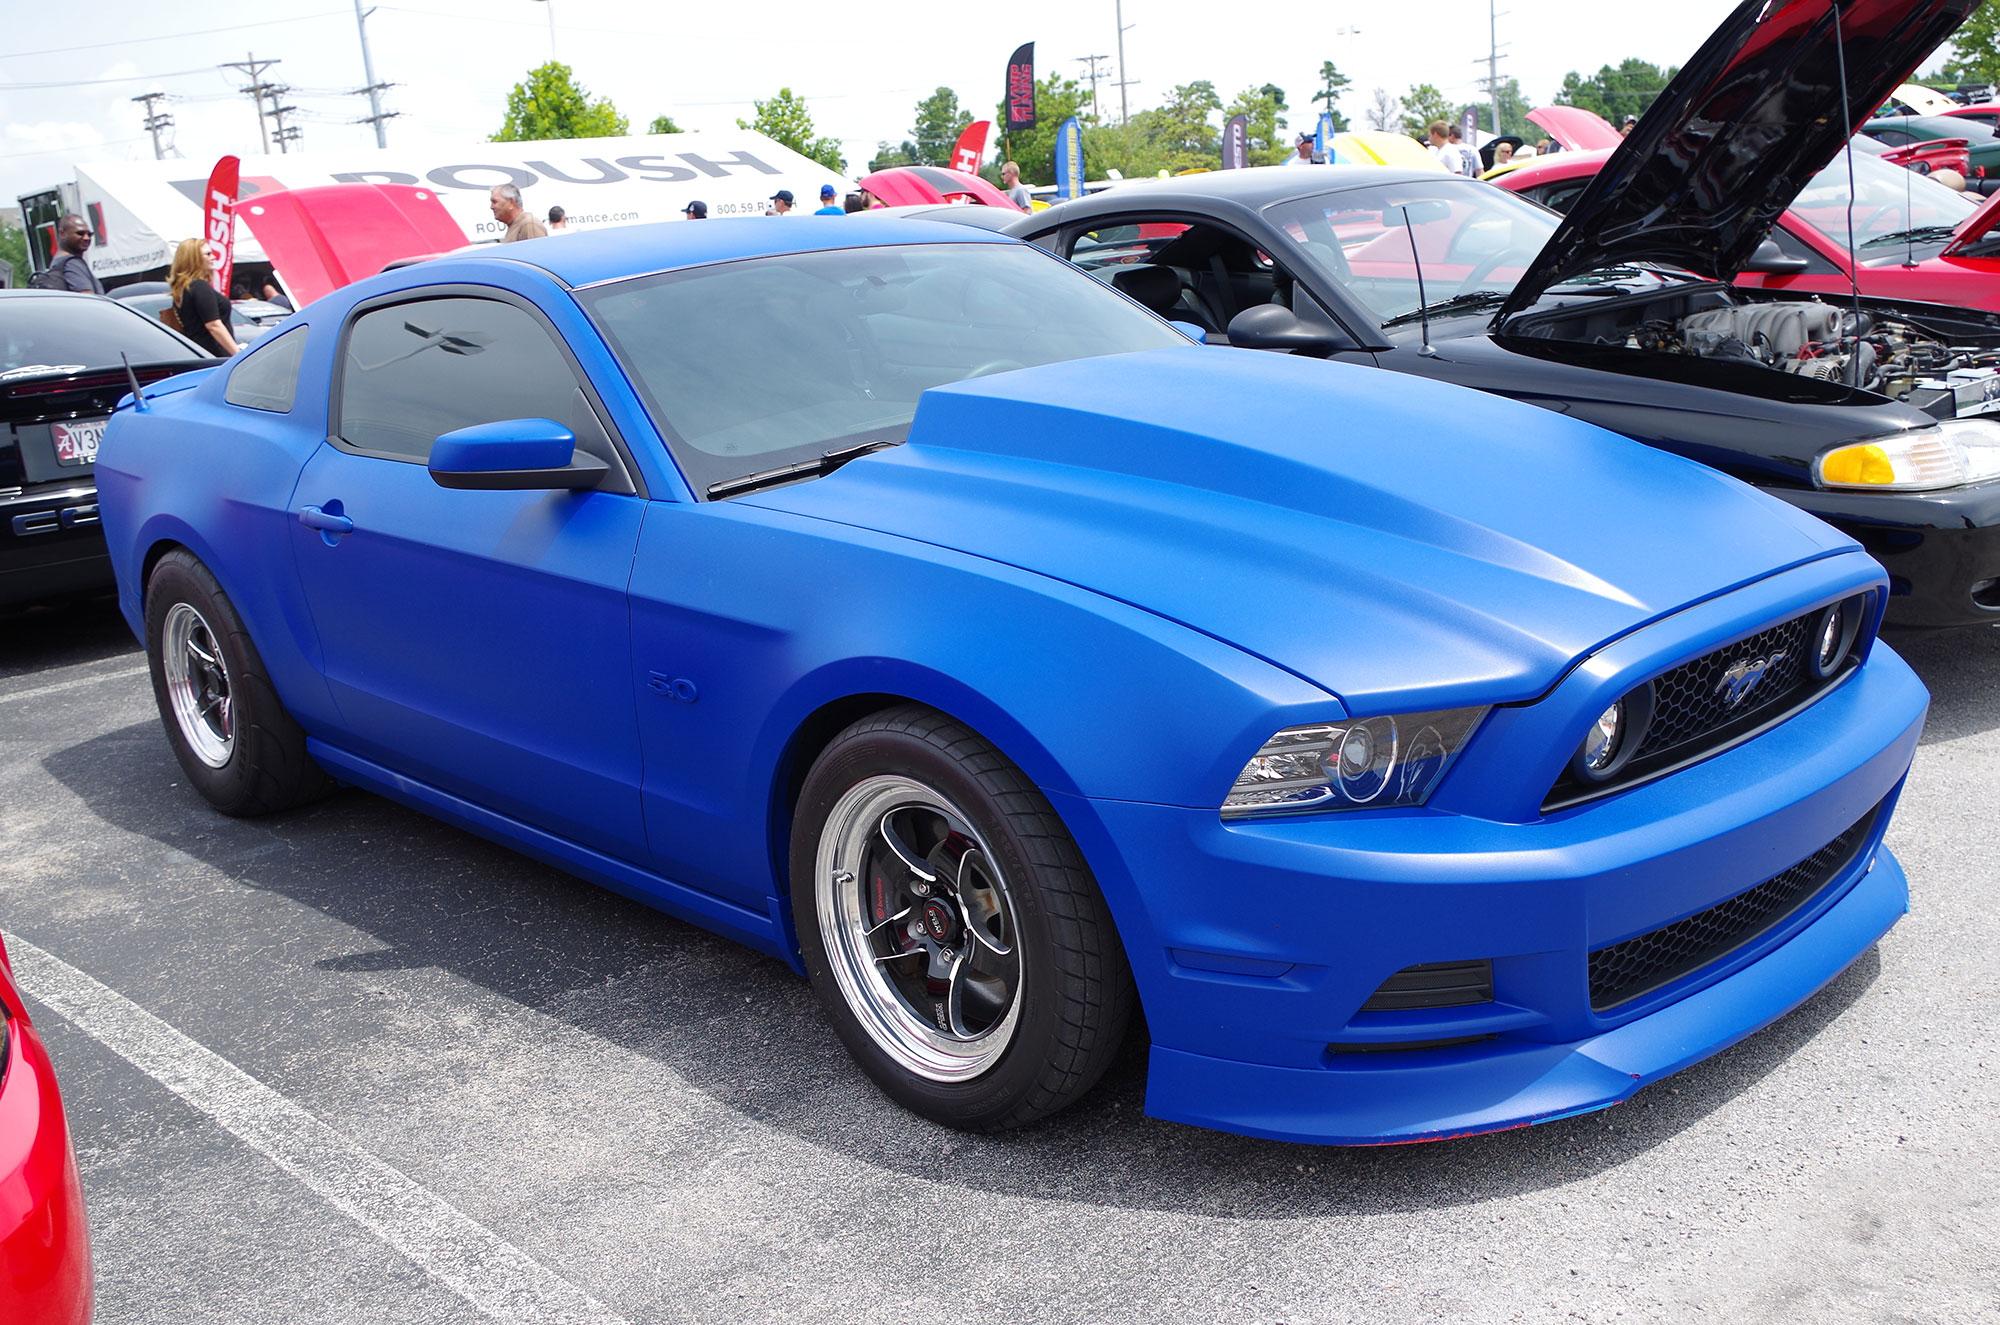 Mustang in a blue final wrap